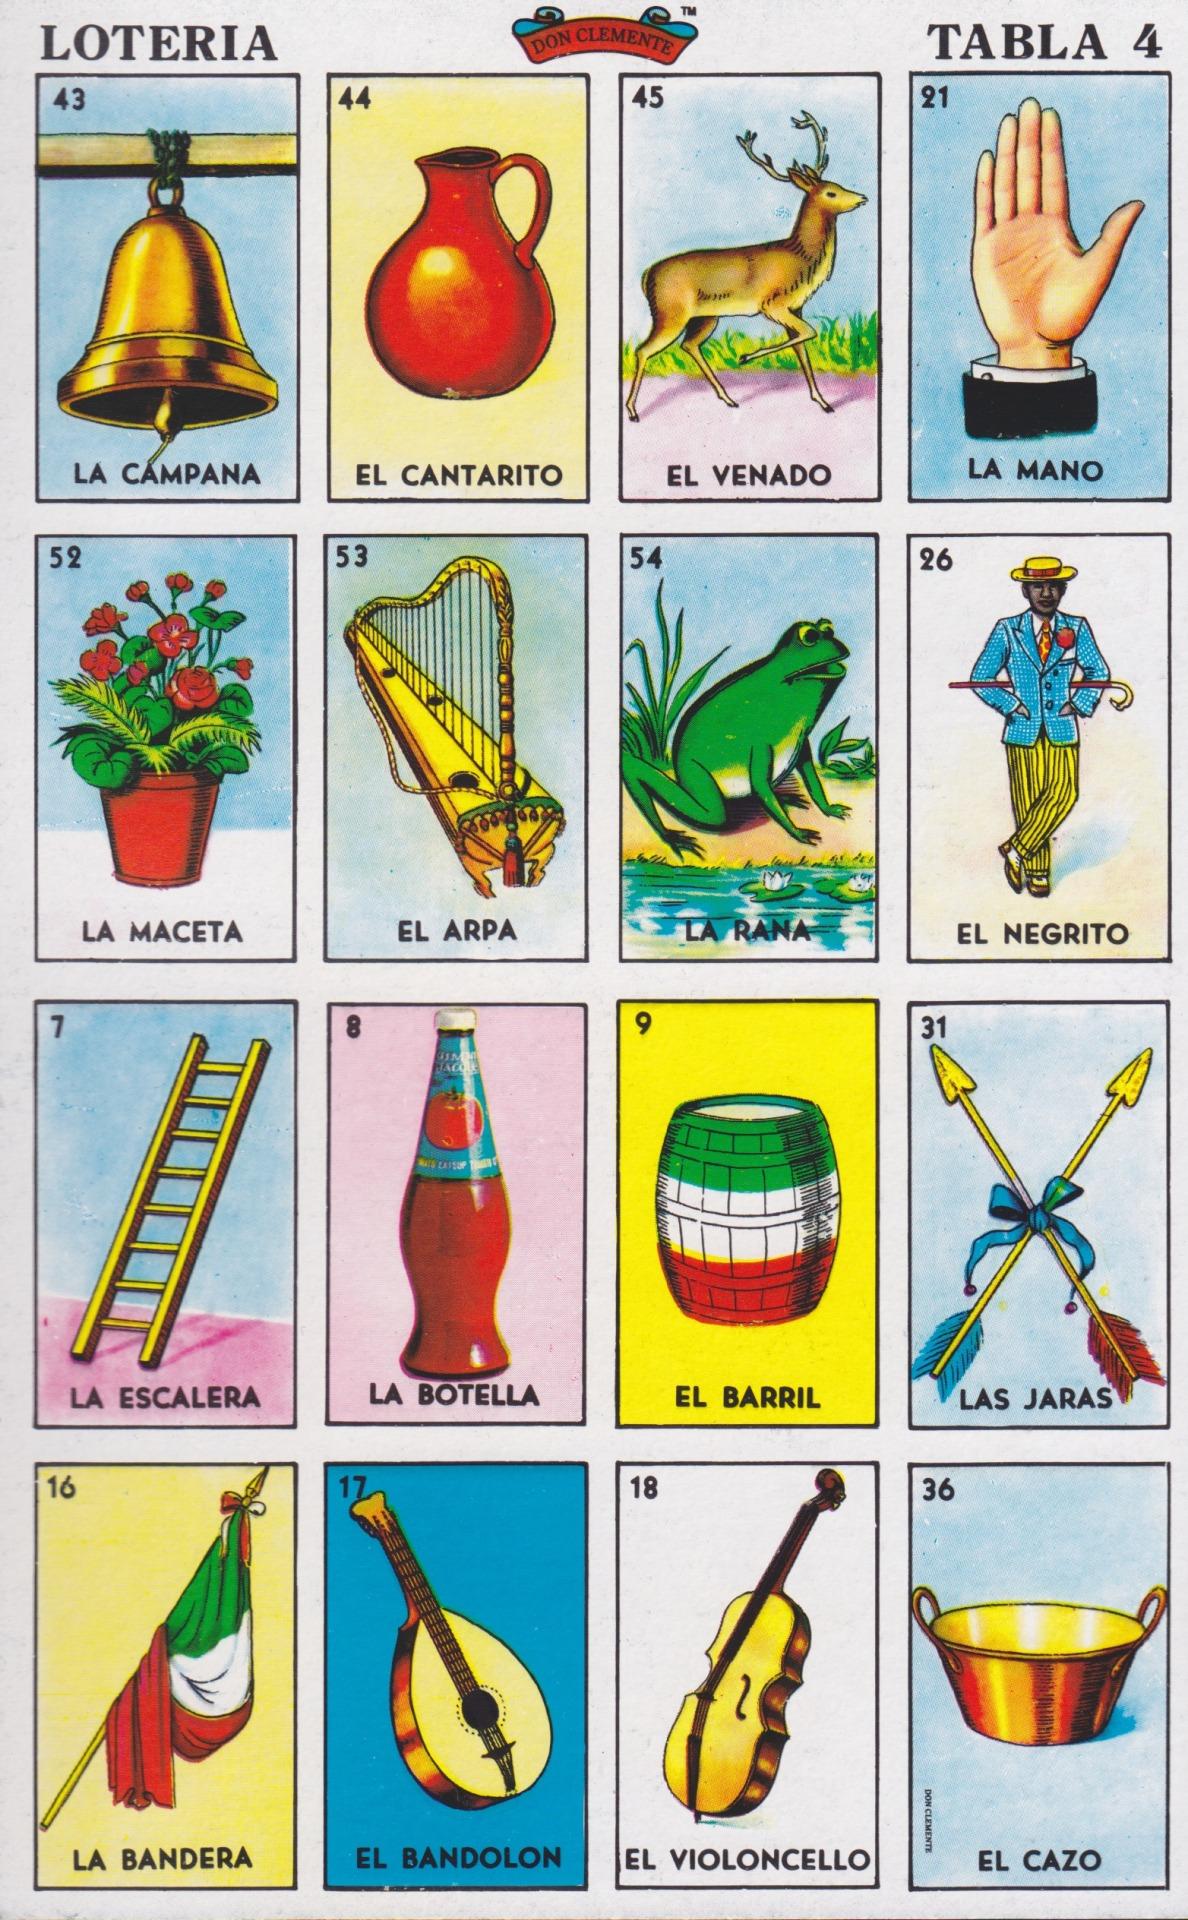 Double stacks netent como jugar loteria México-365049